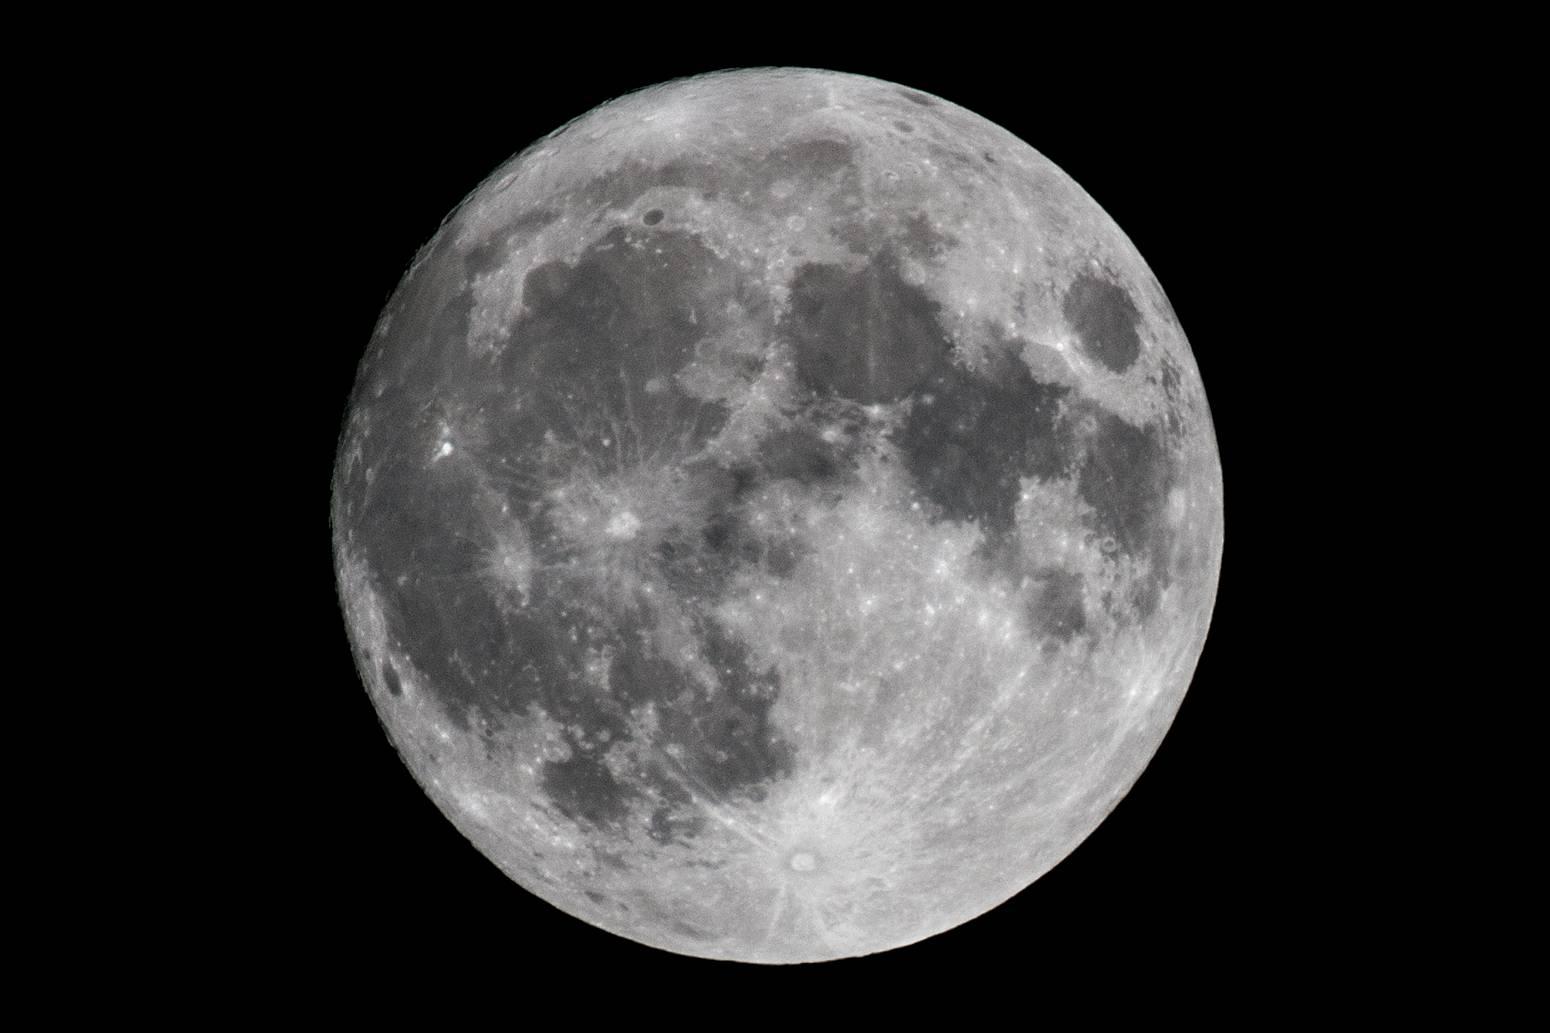 superluna foto de la NASA - Gran quedada para ver la superluna en el Hermógenes Rodríguez